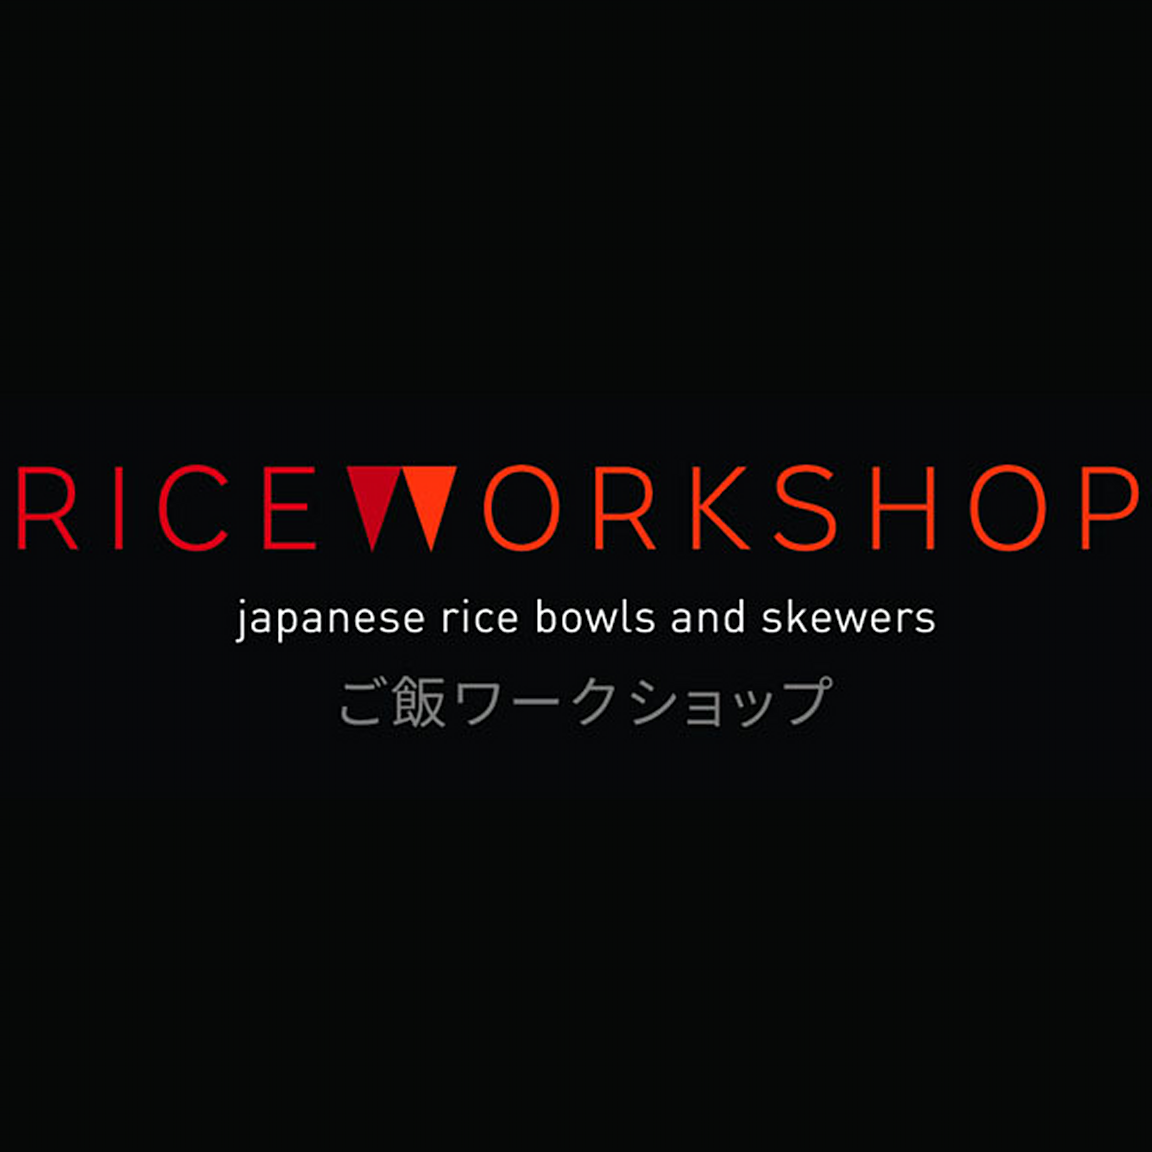 rice-workshop-logo